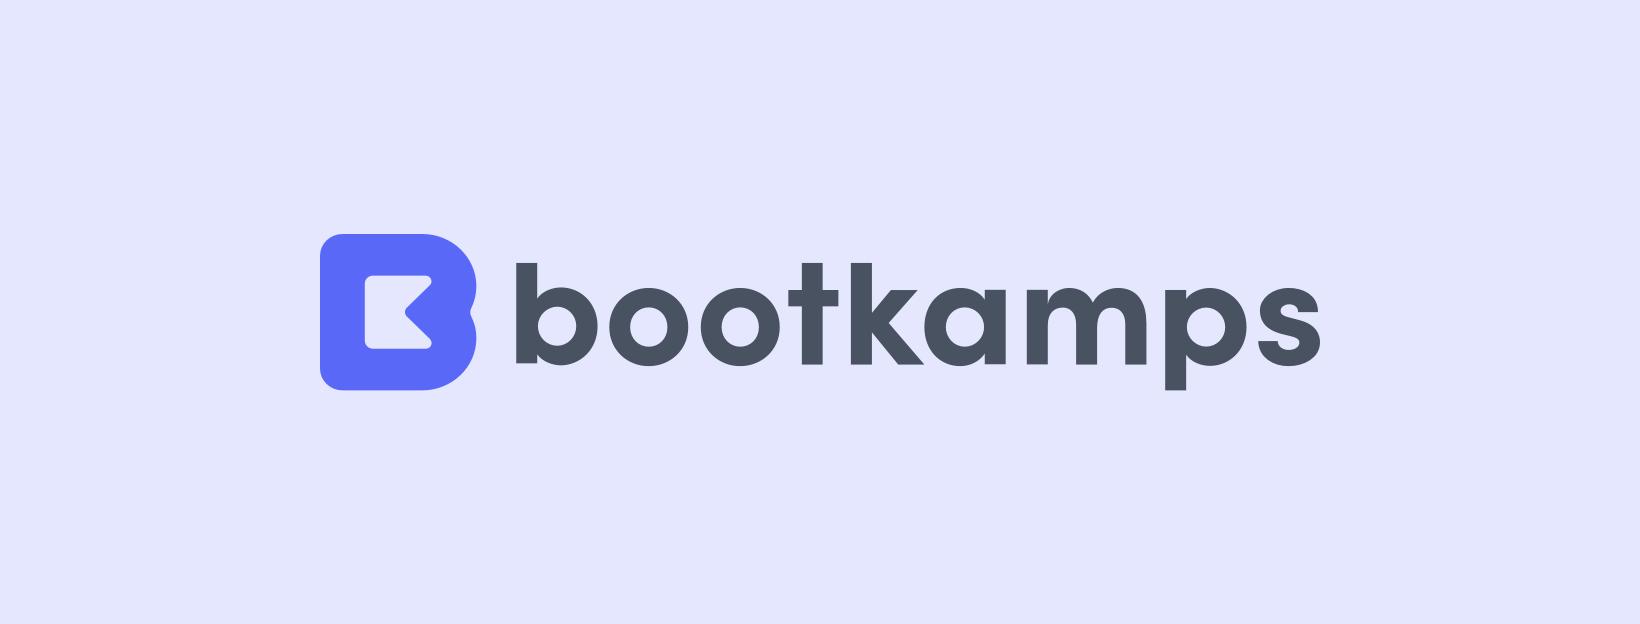 bootkamps_banner_facebook.png